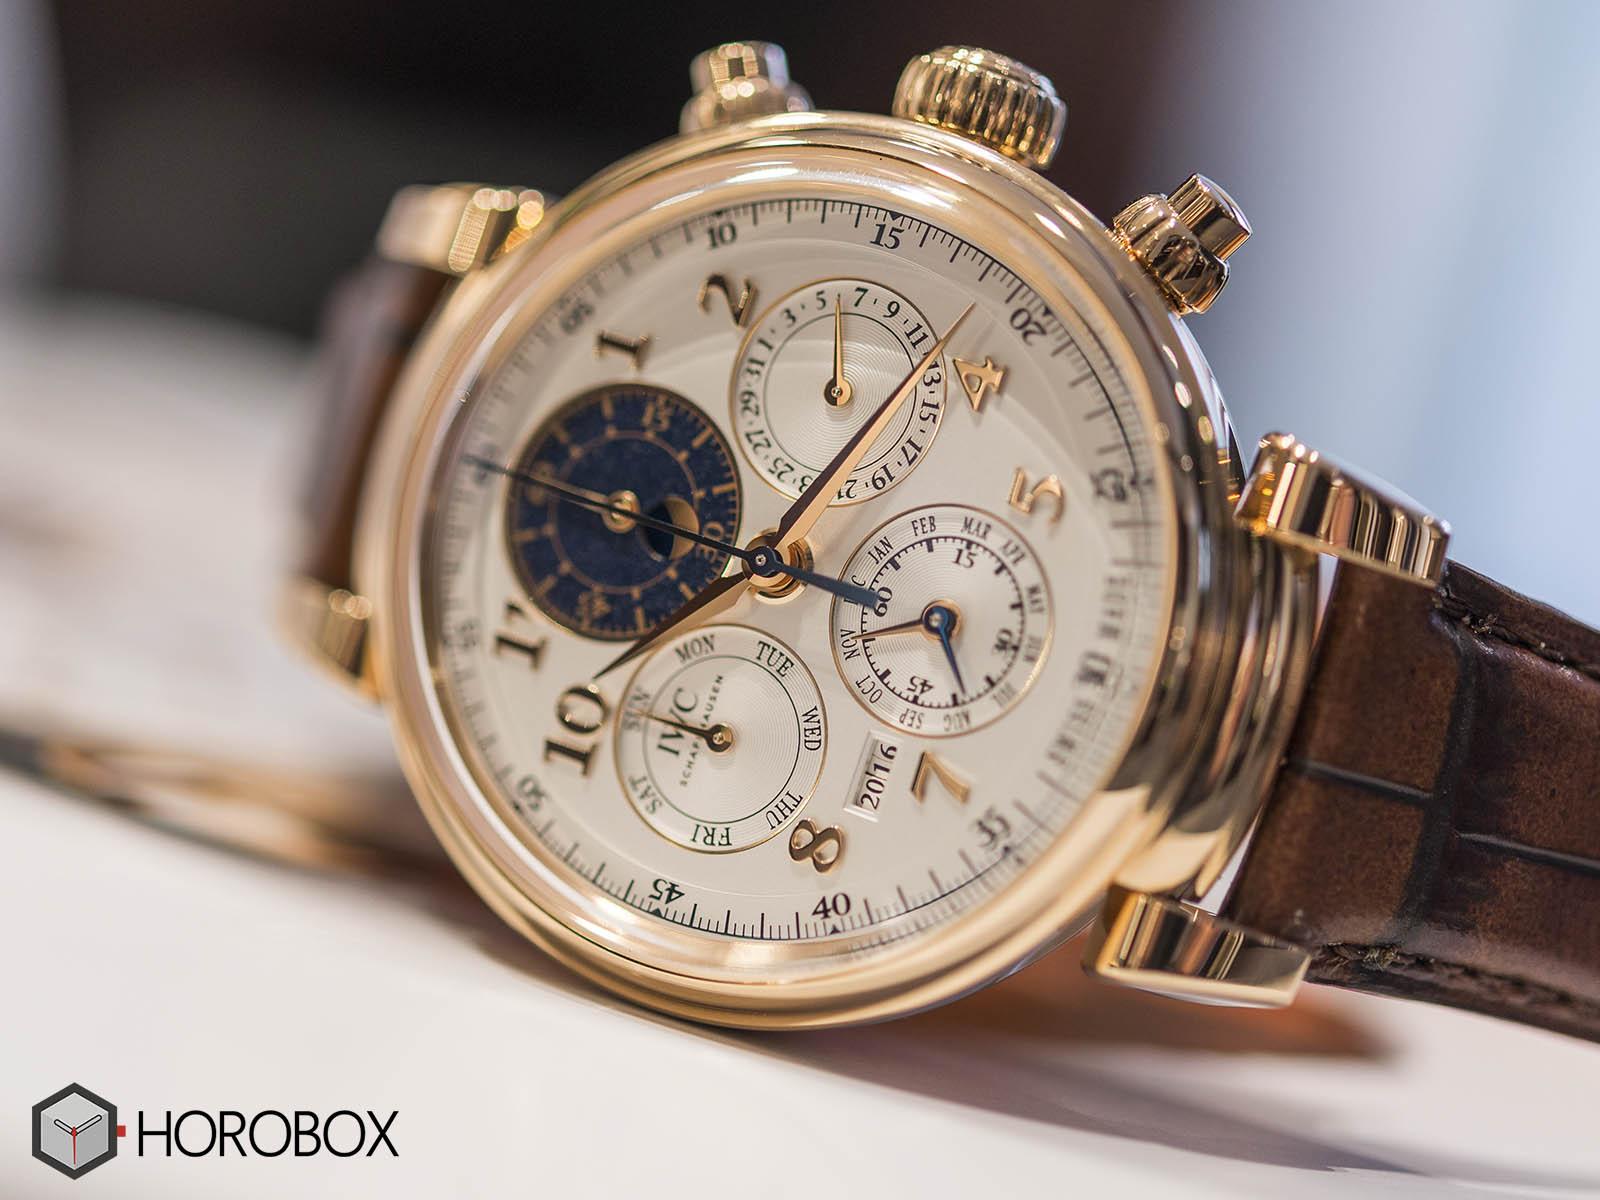 iwc-da-vinci-perpetual-calendar-chronograph-iw392101-4-.jpg